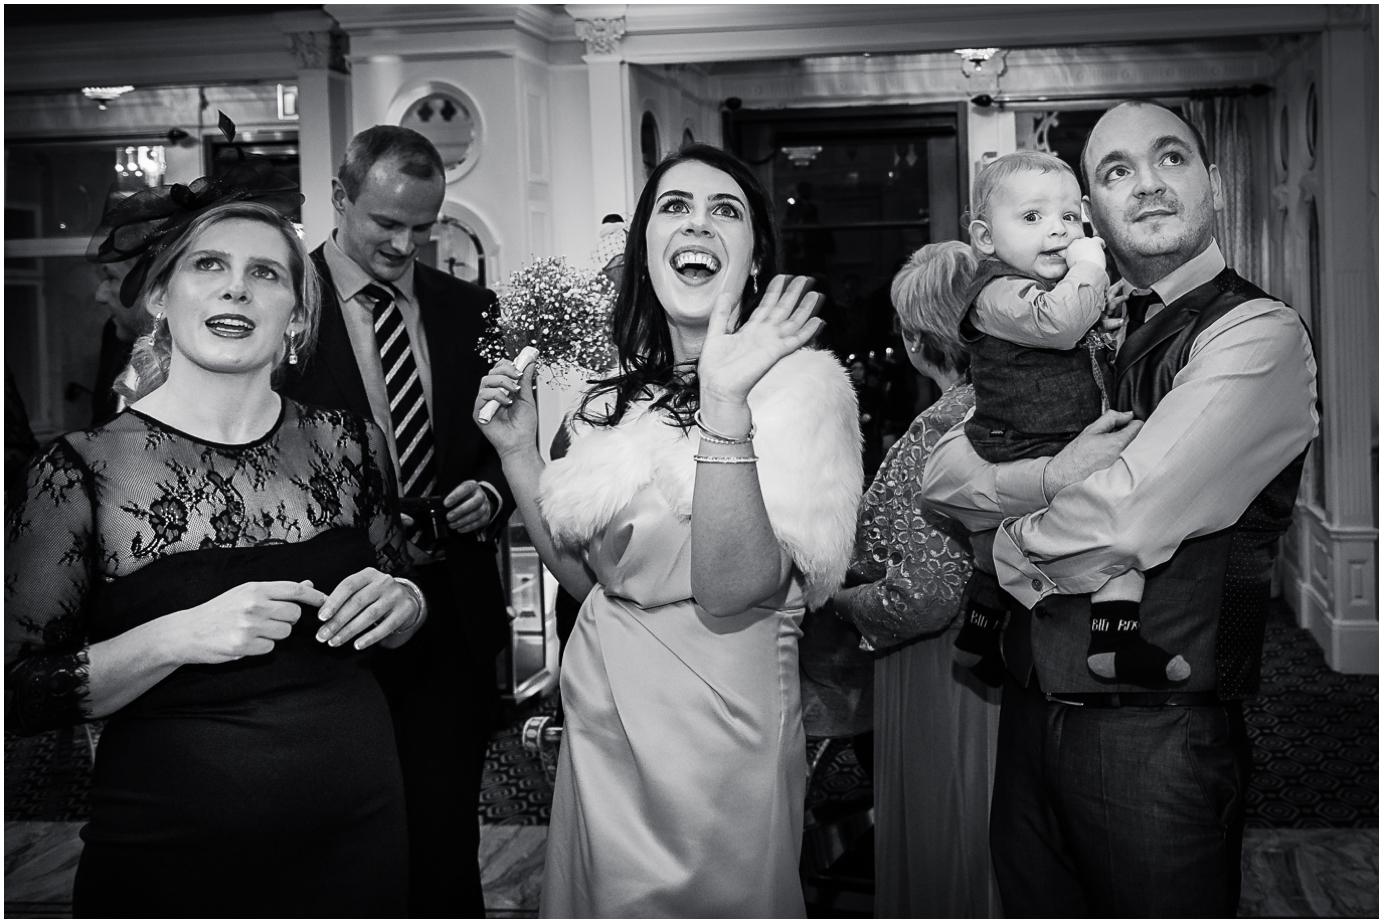 55 - Esmat and Angus - St. Ermin's Hotel London wedding photographer